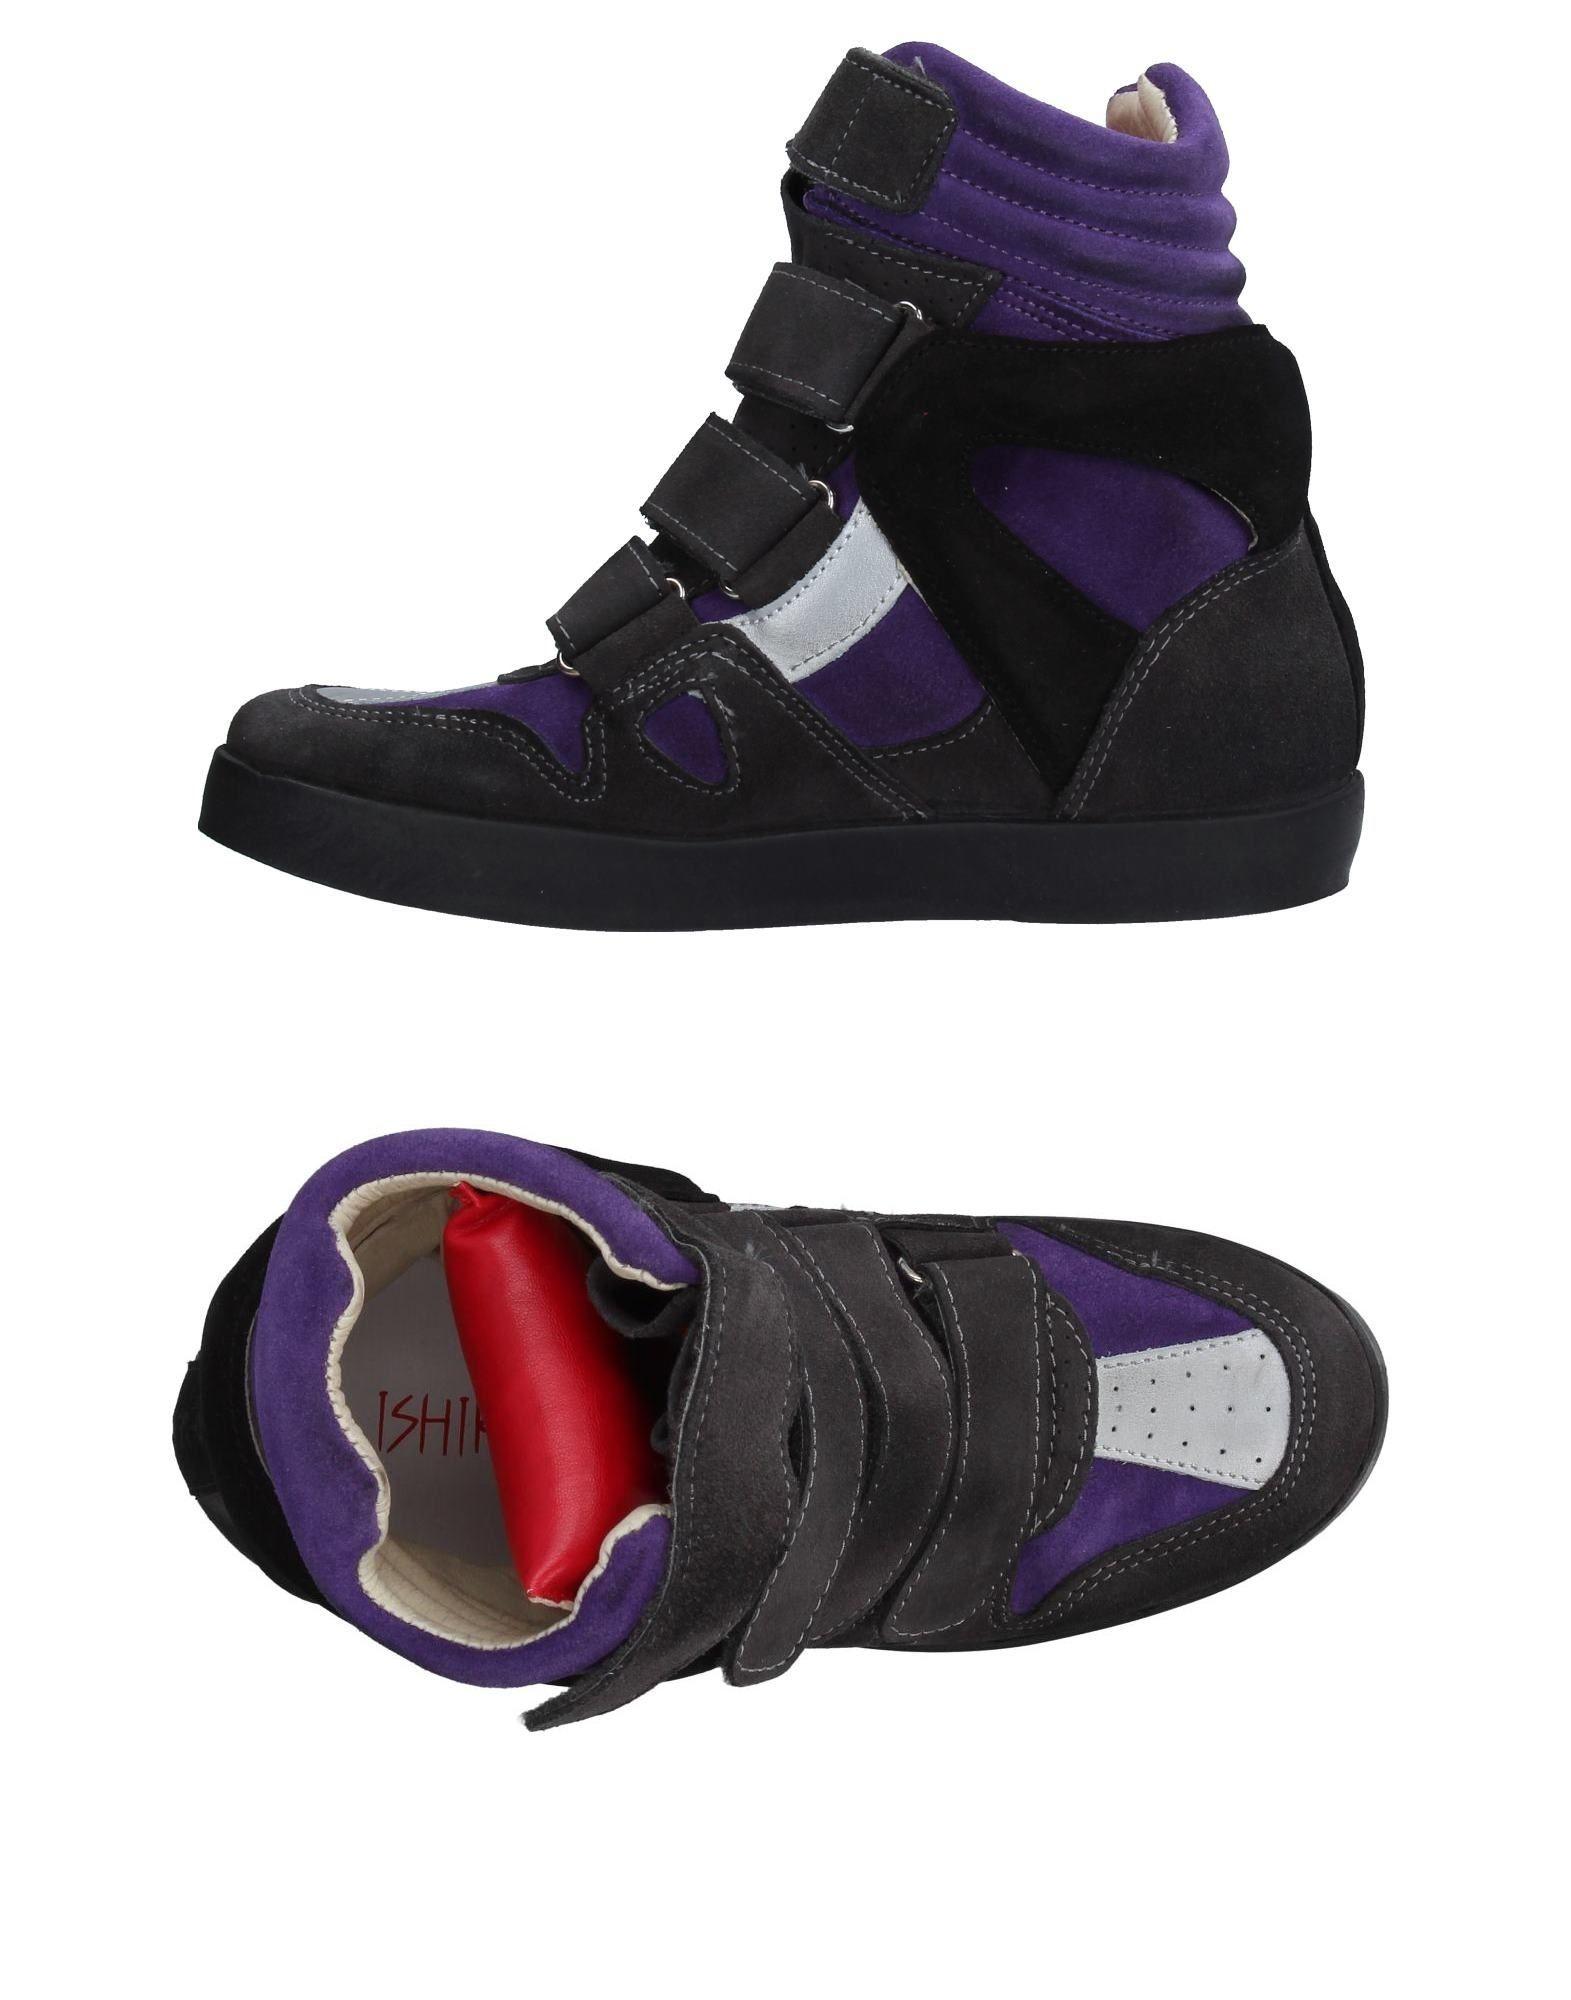 A buon mercato Sneakers Ishikawa Donna - 11227173TA